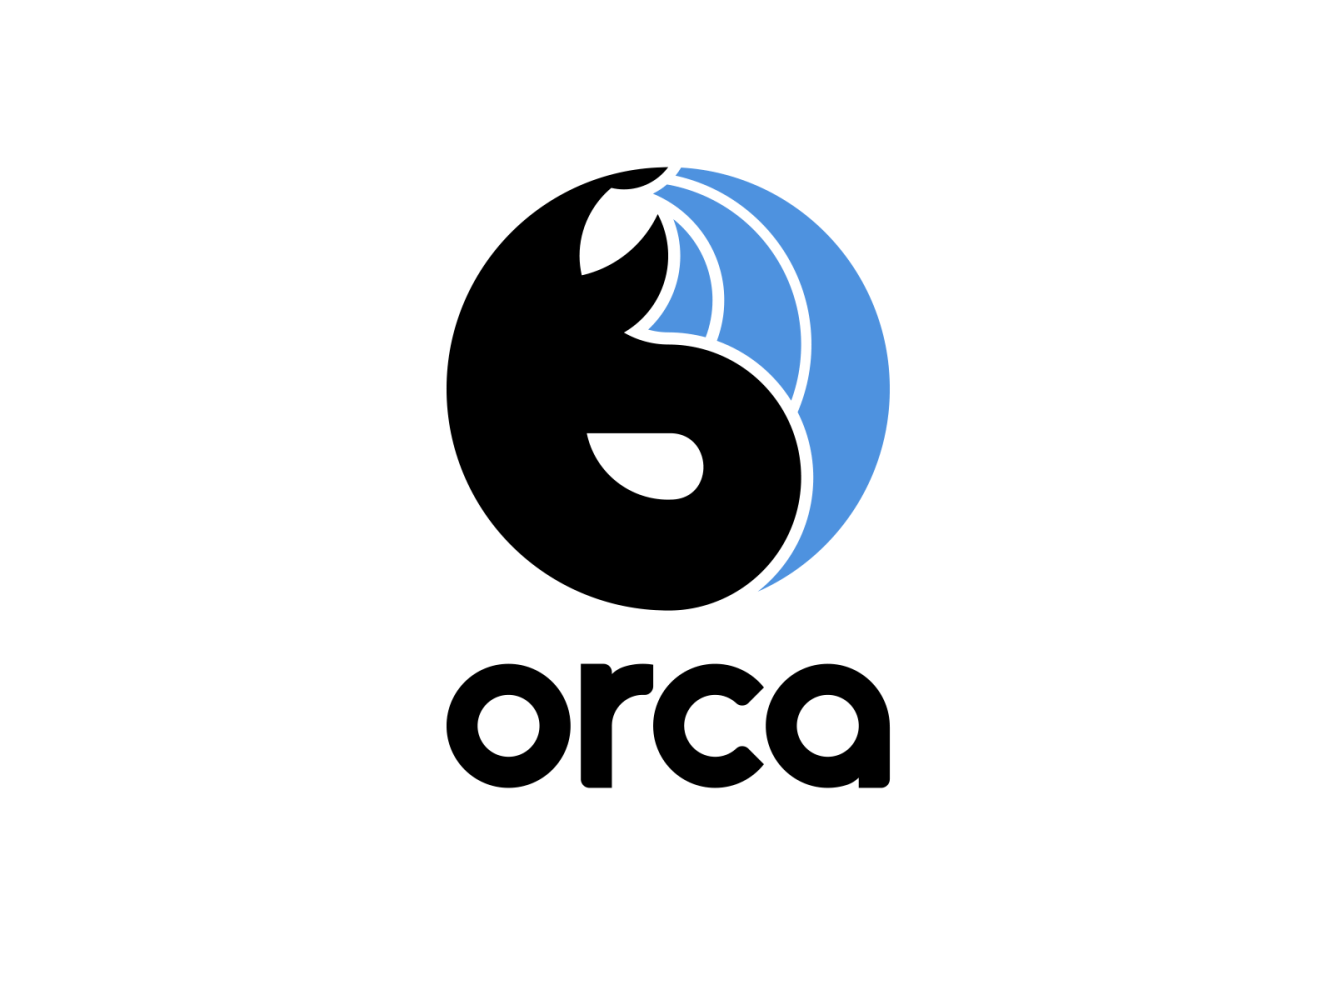 A logo designed for Orca, a marketing automation app